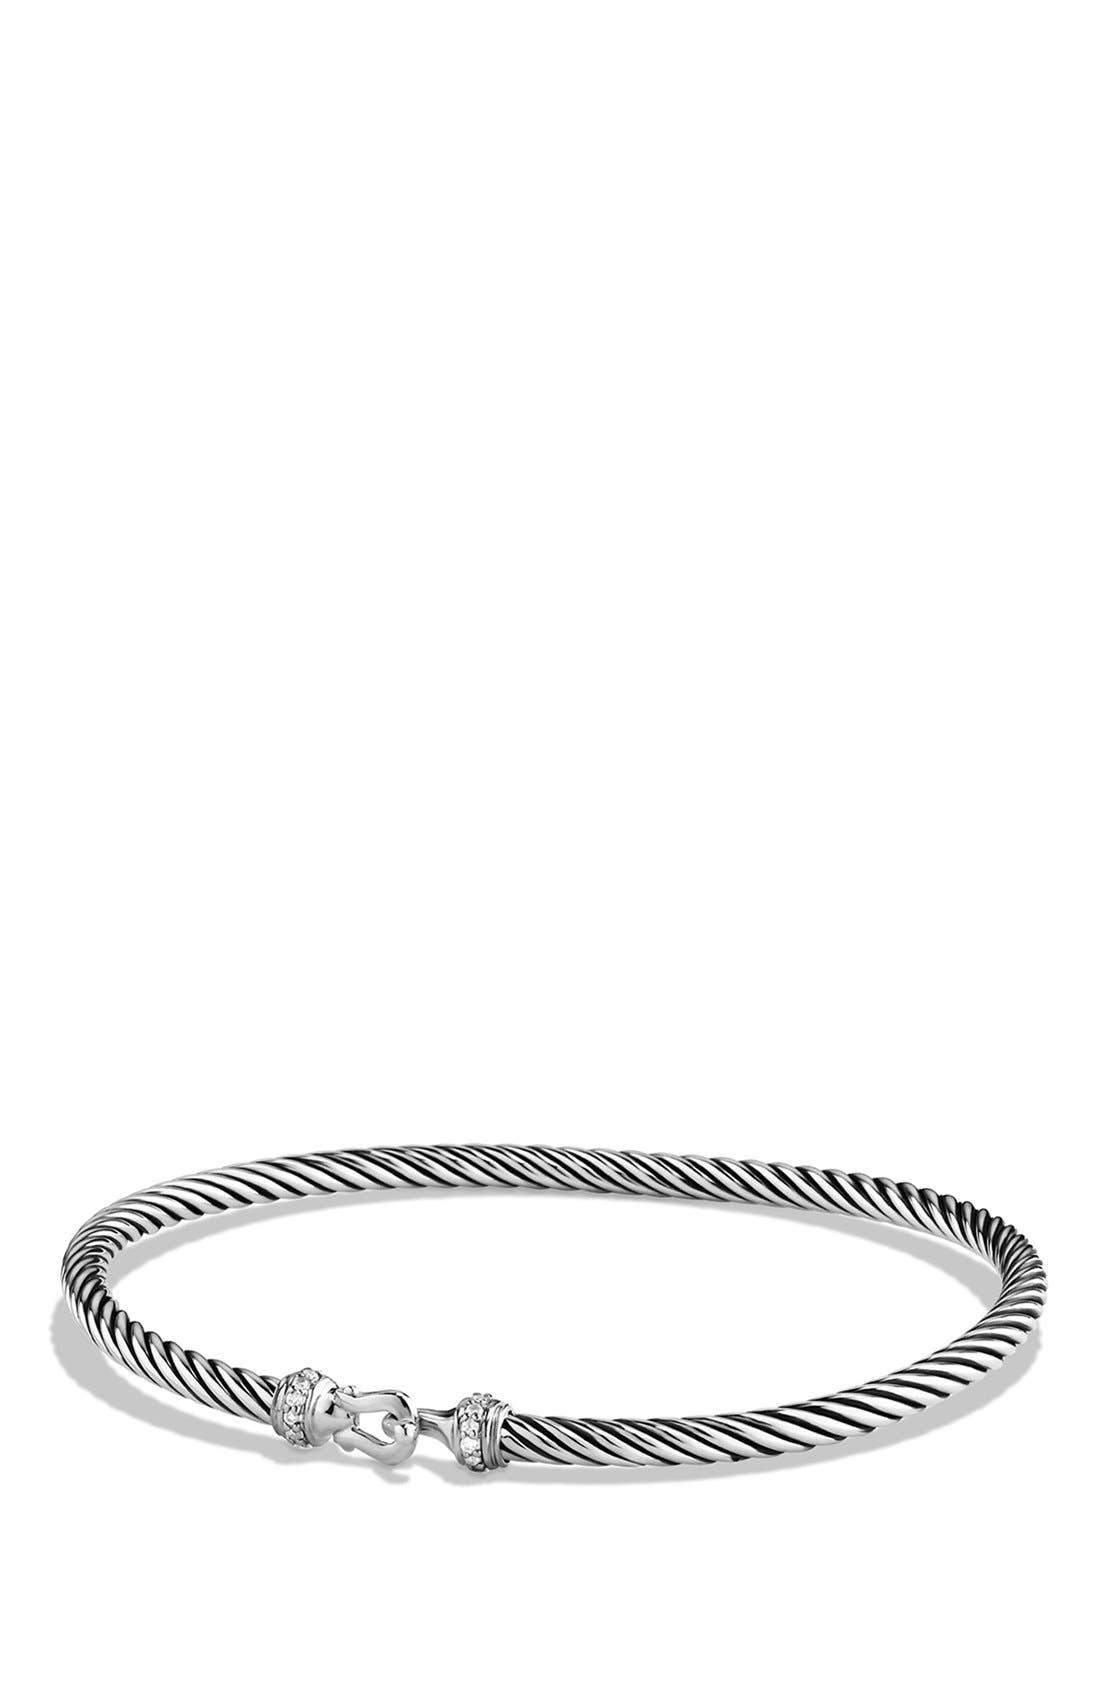 DAVID YURMAN,                             Cable Collectibles Buckle Bangle Bracelet with Diamonds, 3mm,                             Main thumbnail 1, color,                             DIAMOND